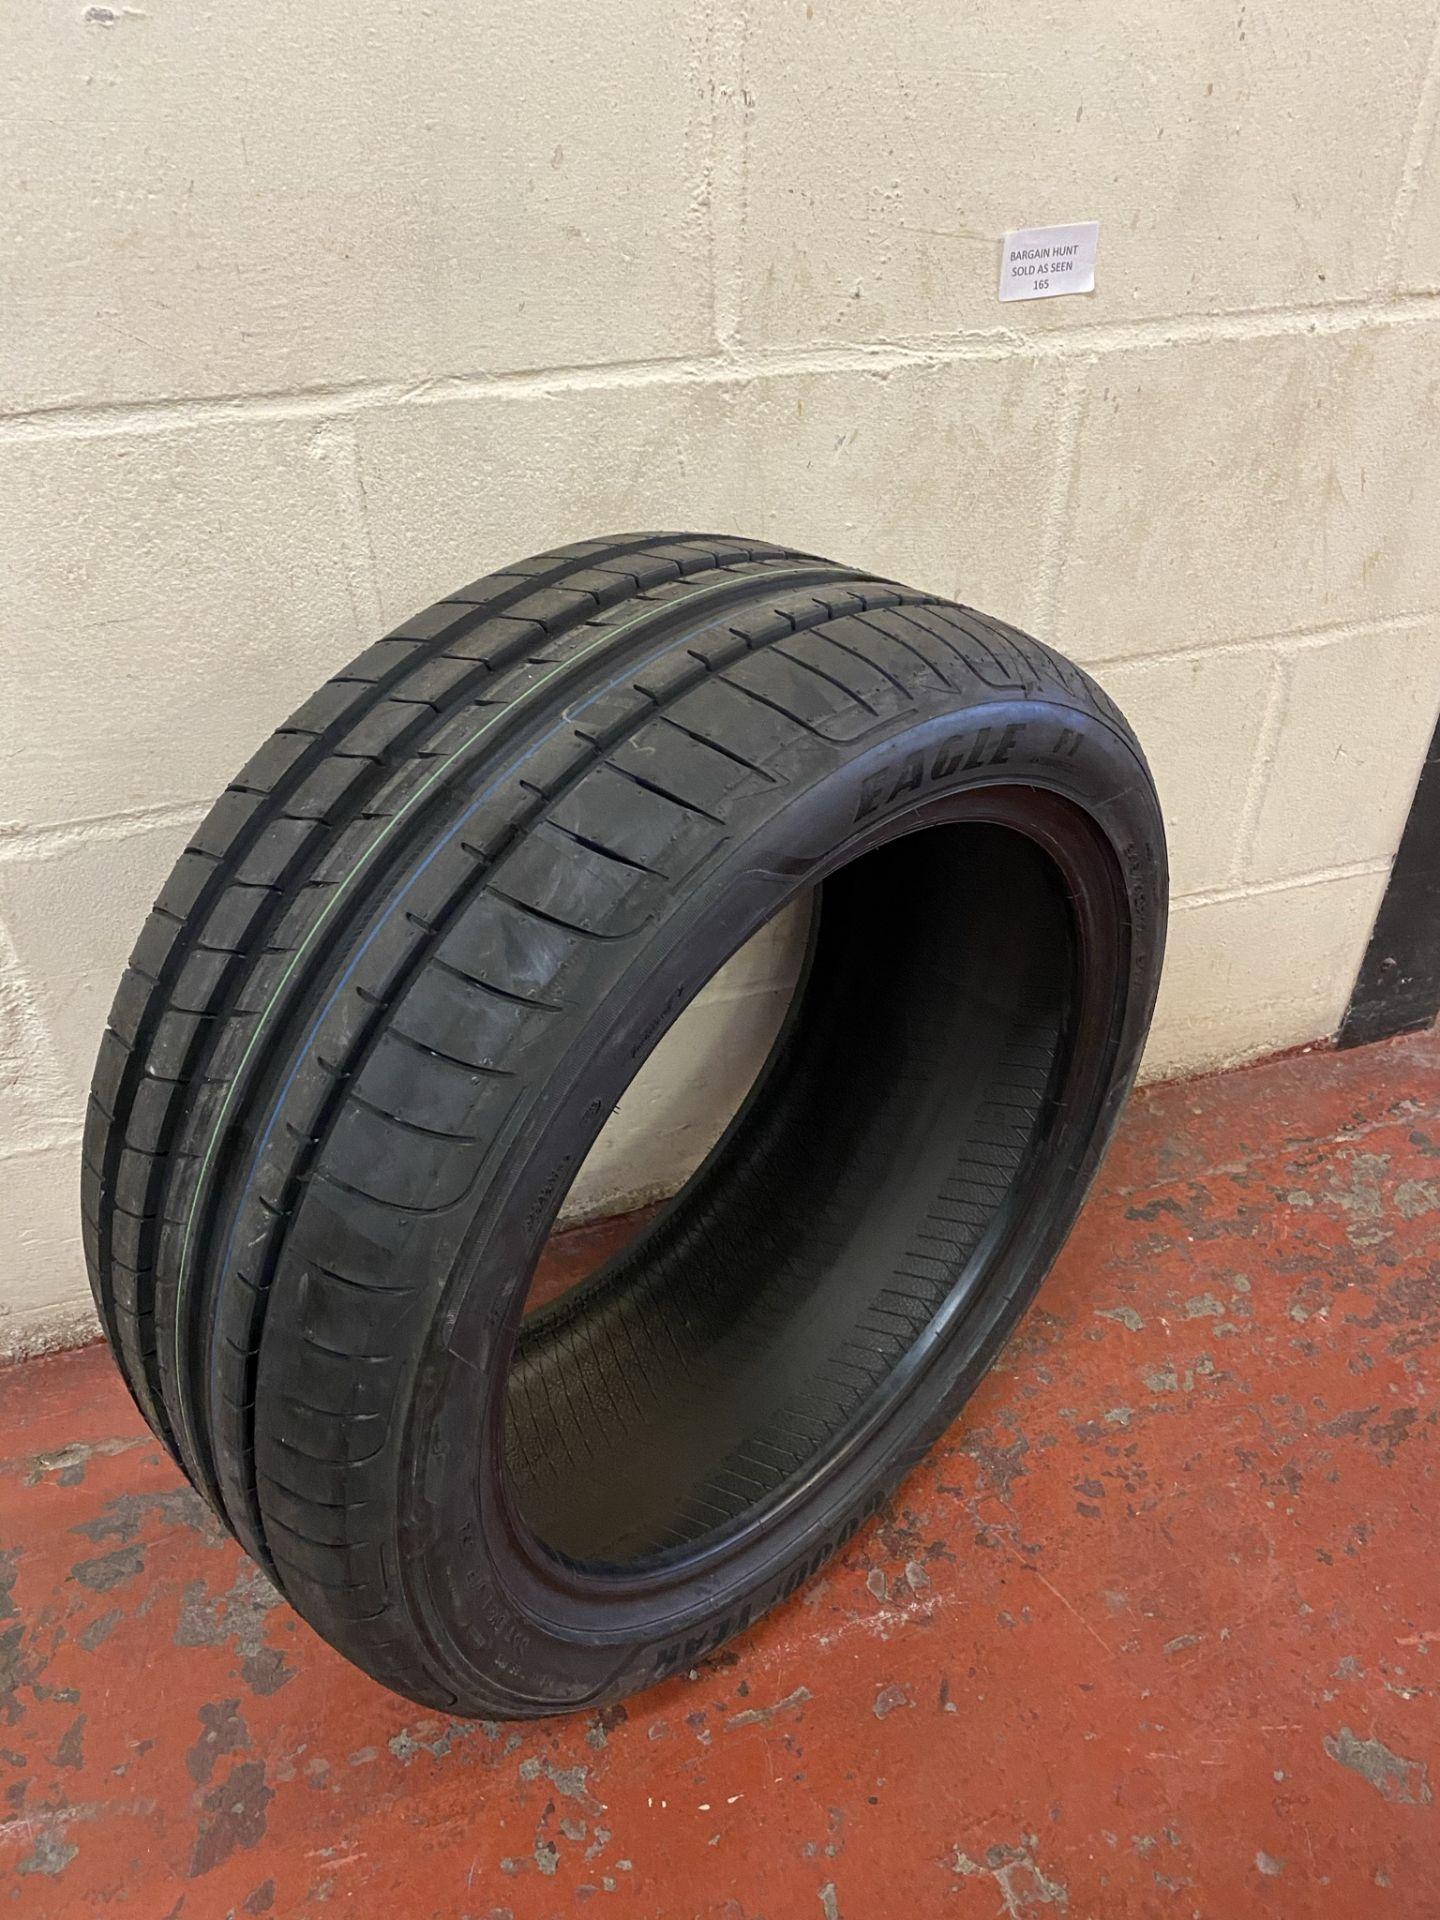 Goodyear Eagle F1 Asymmetric 3 FP - 245/40R17 91Y - Summer Tire RRP £100 - Image 2 of 2